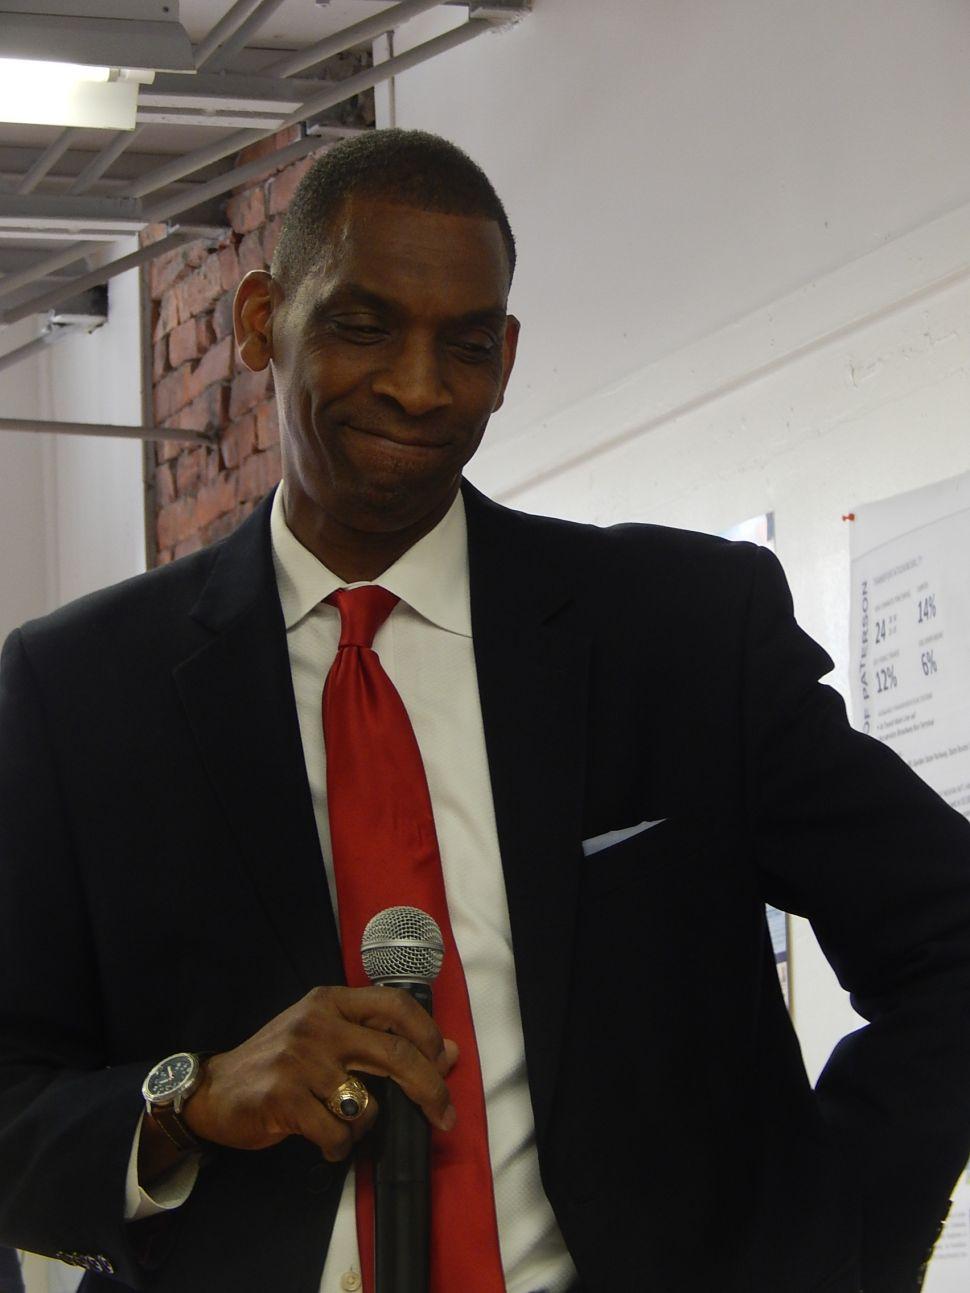 Incumbent Jones buried in Paterson mayor's race